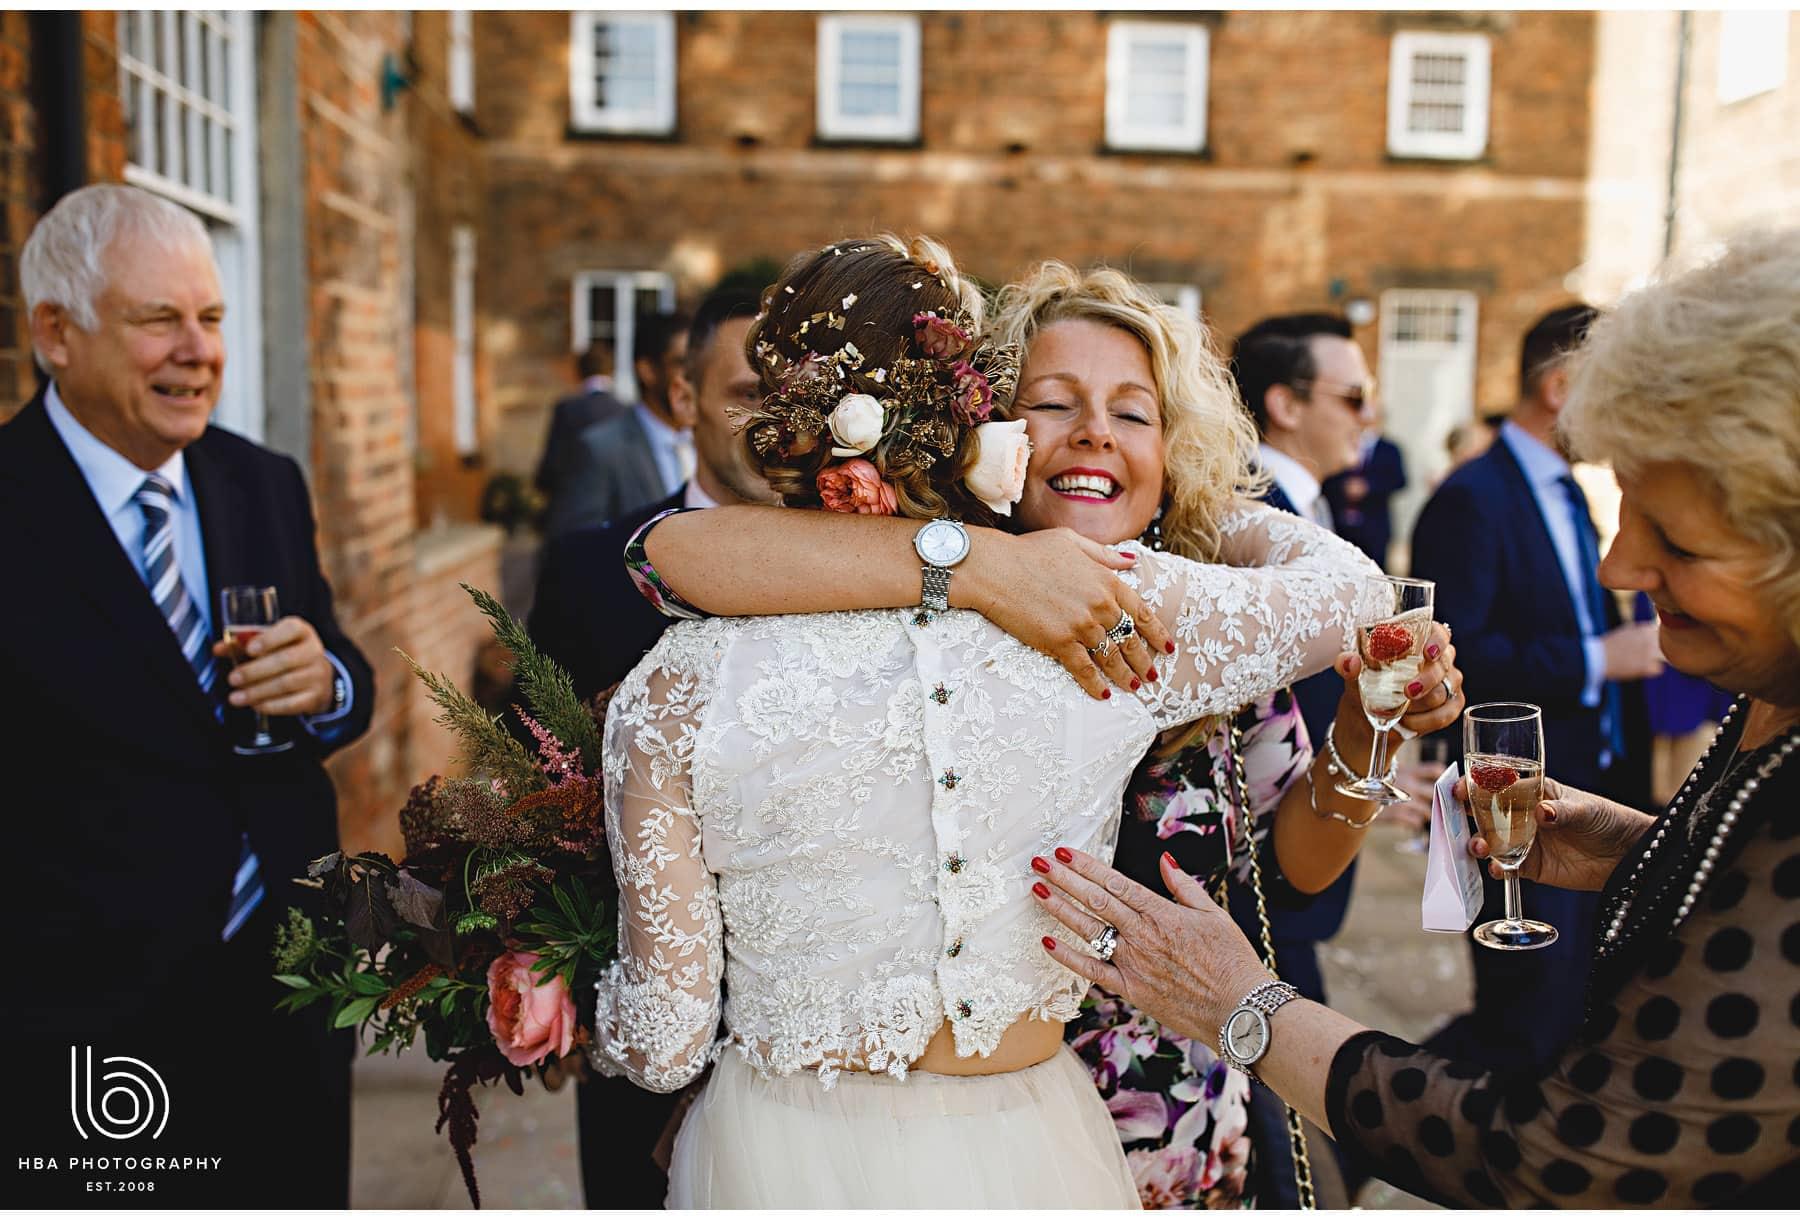 the bride hugging guests